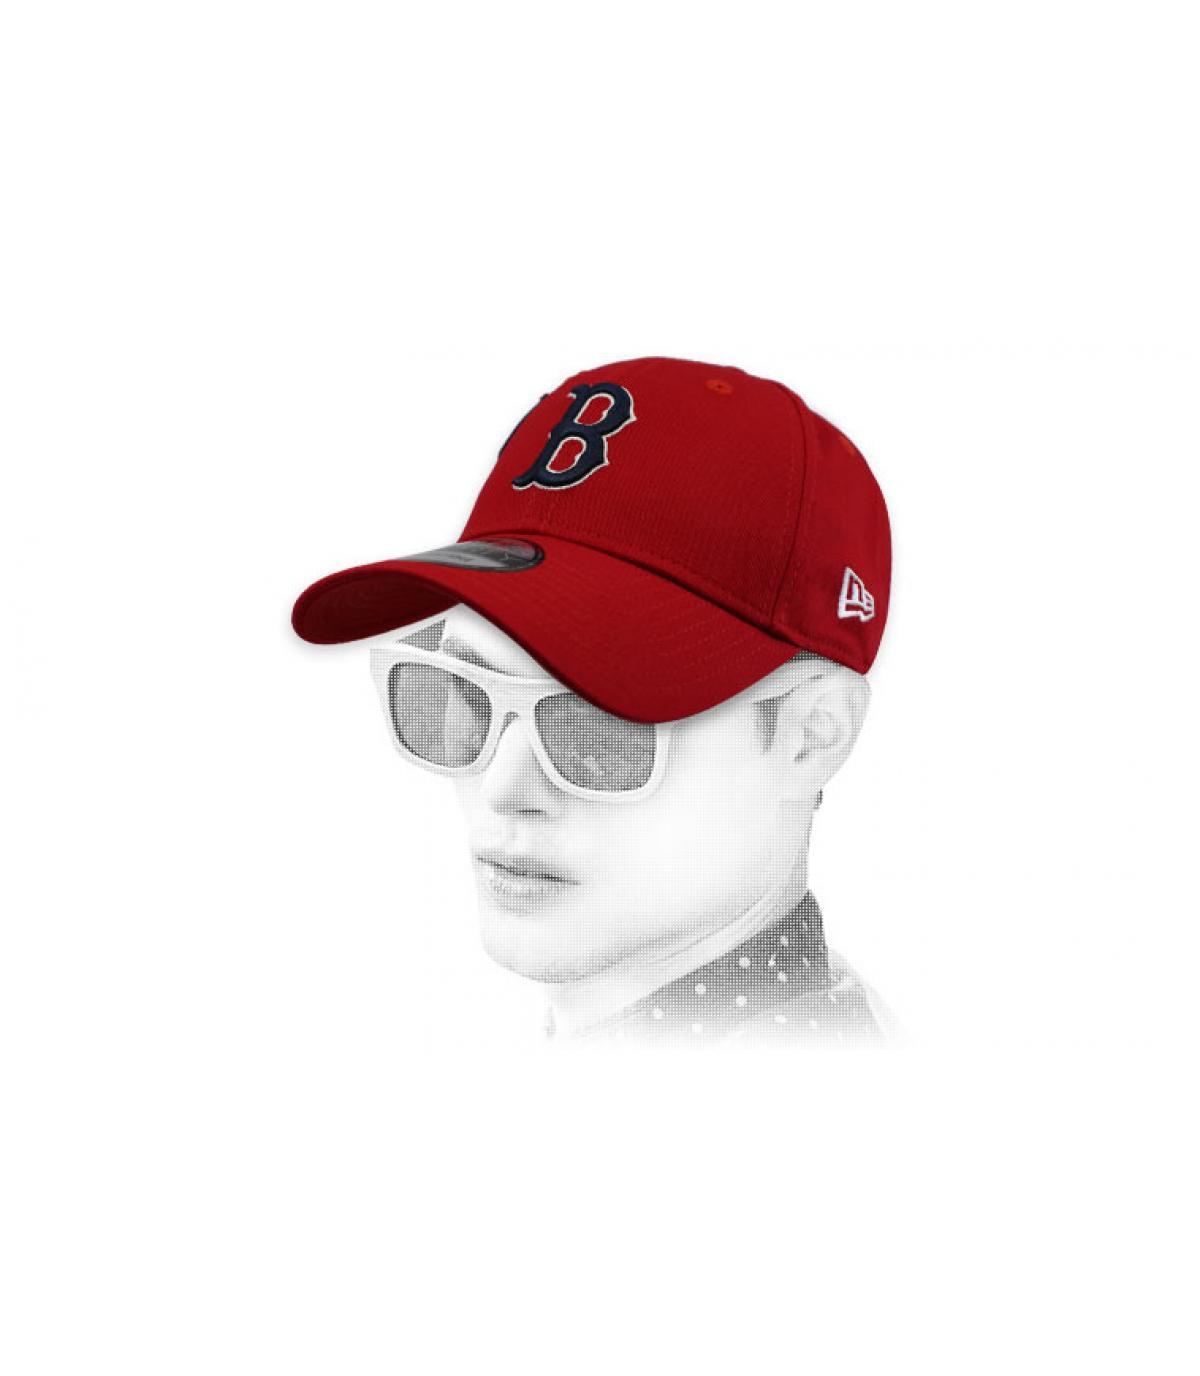 gorra B rojo